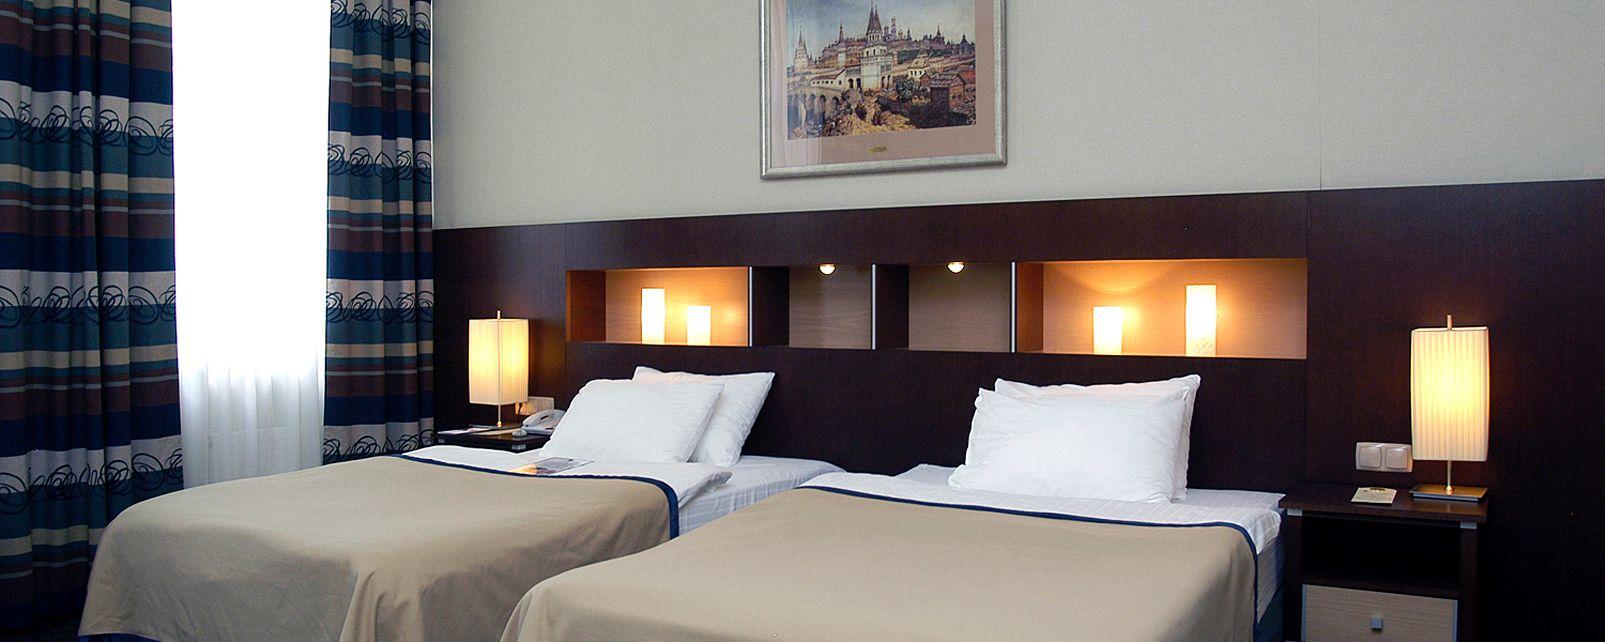 Hotel Pierre I